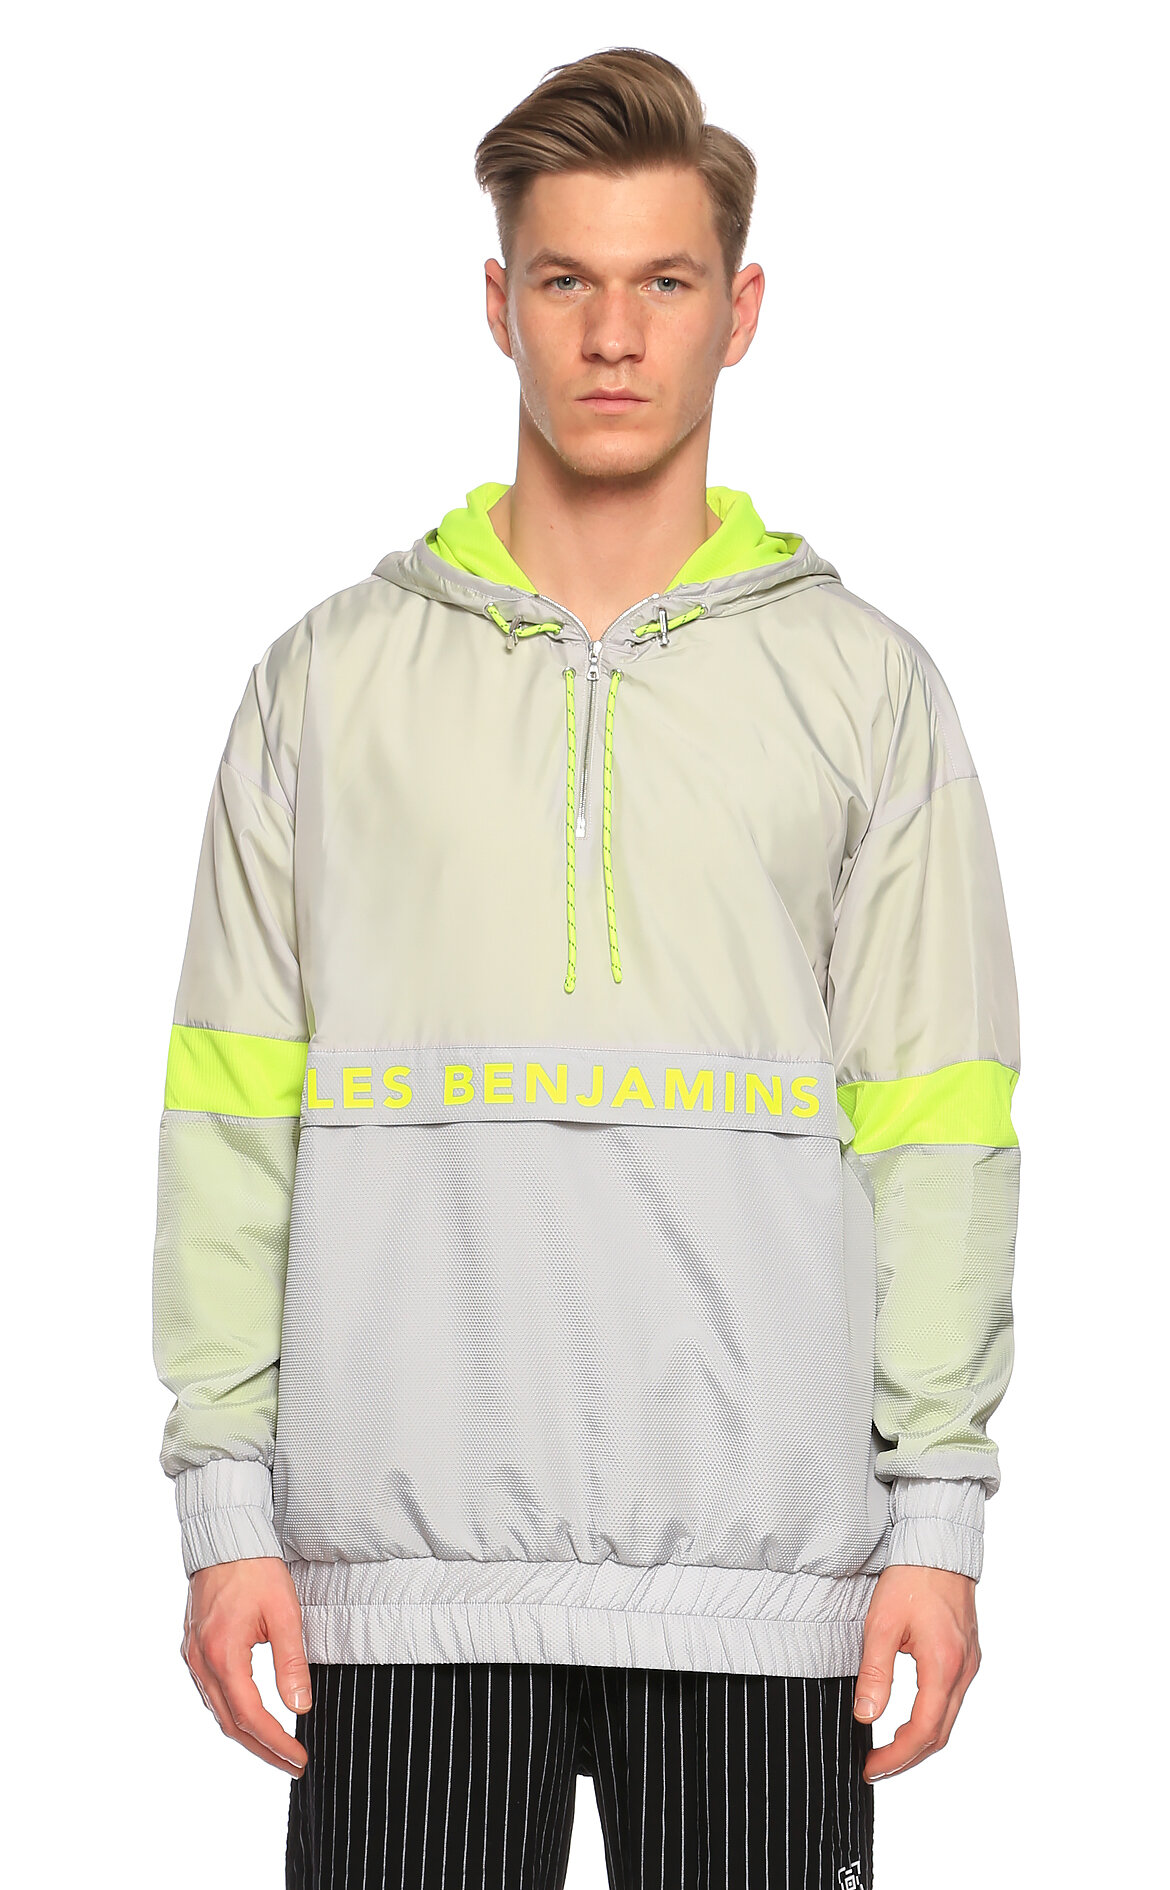 Les Benjamins-Les Benjamins Kapüşonlu Neon Gri-Sarı Sweatshirt